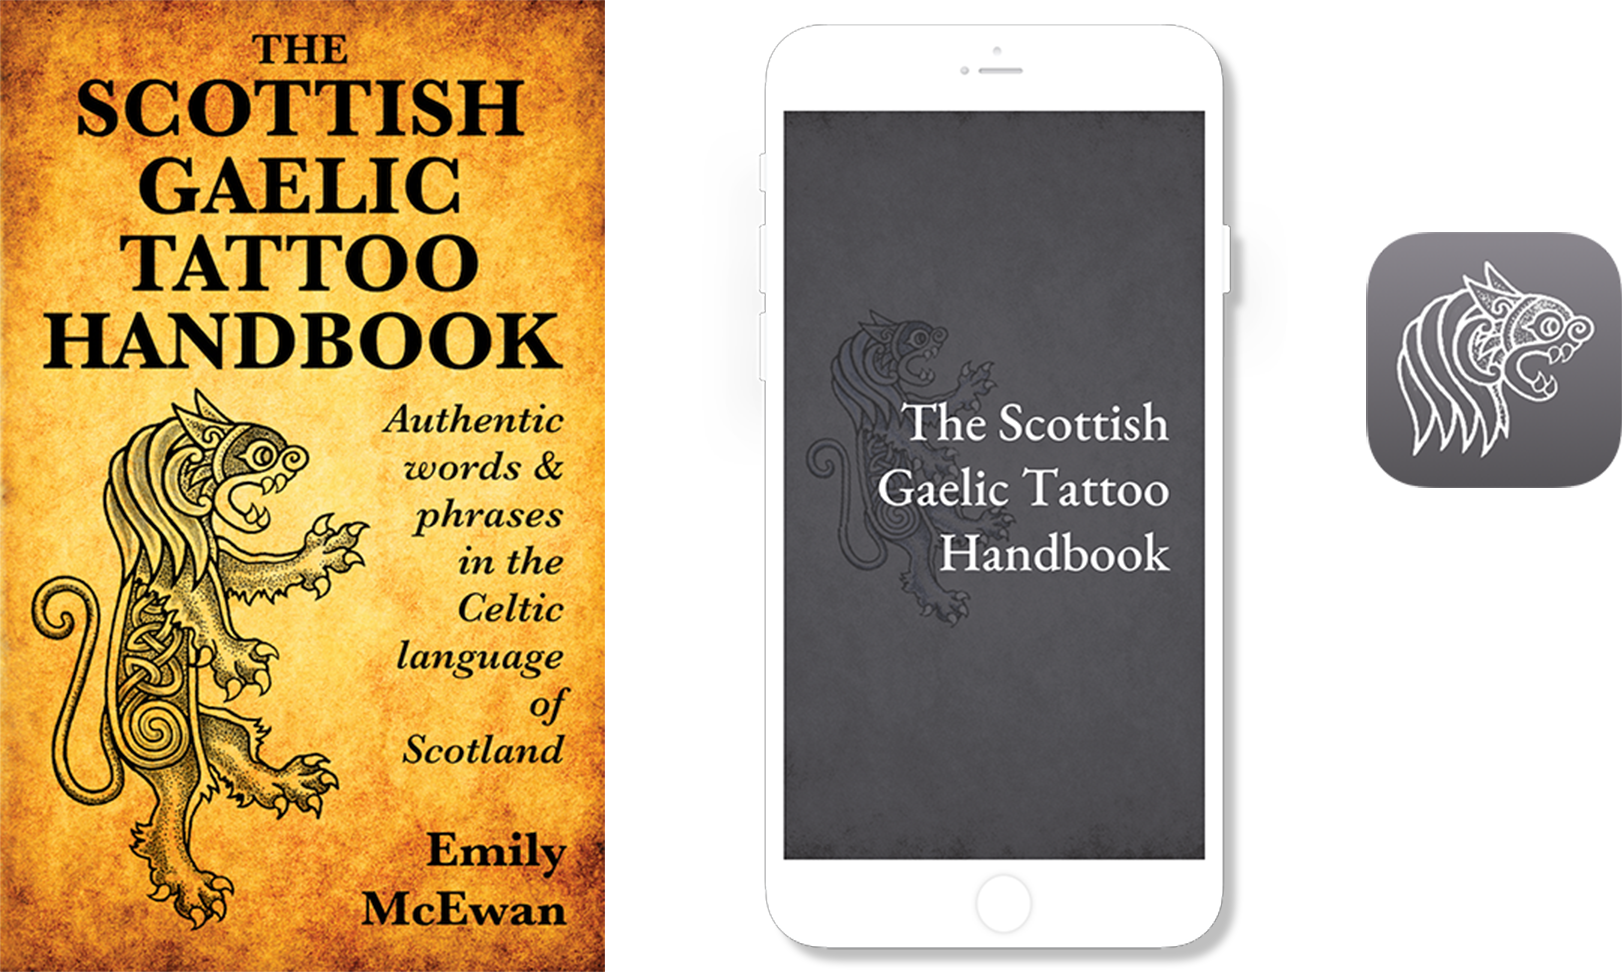 Scottish Gaelic Tattoo Handbook • Mobile App